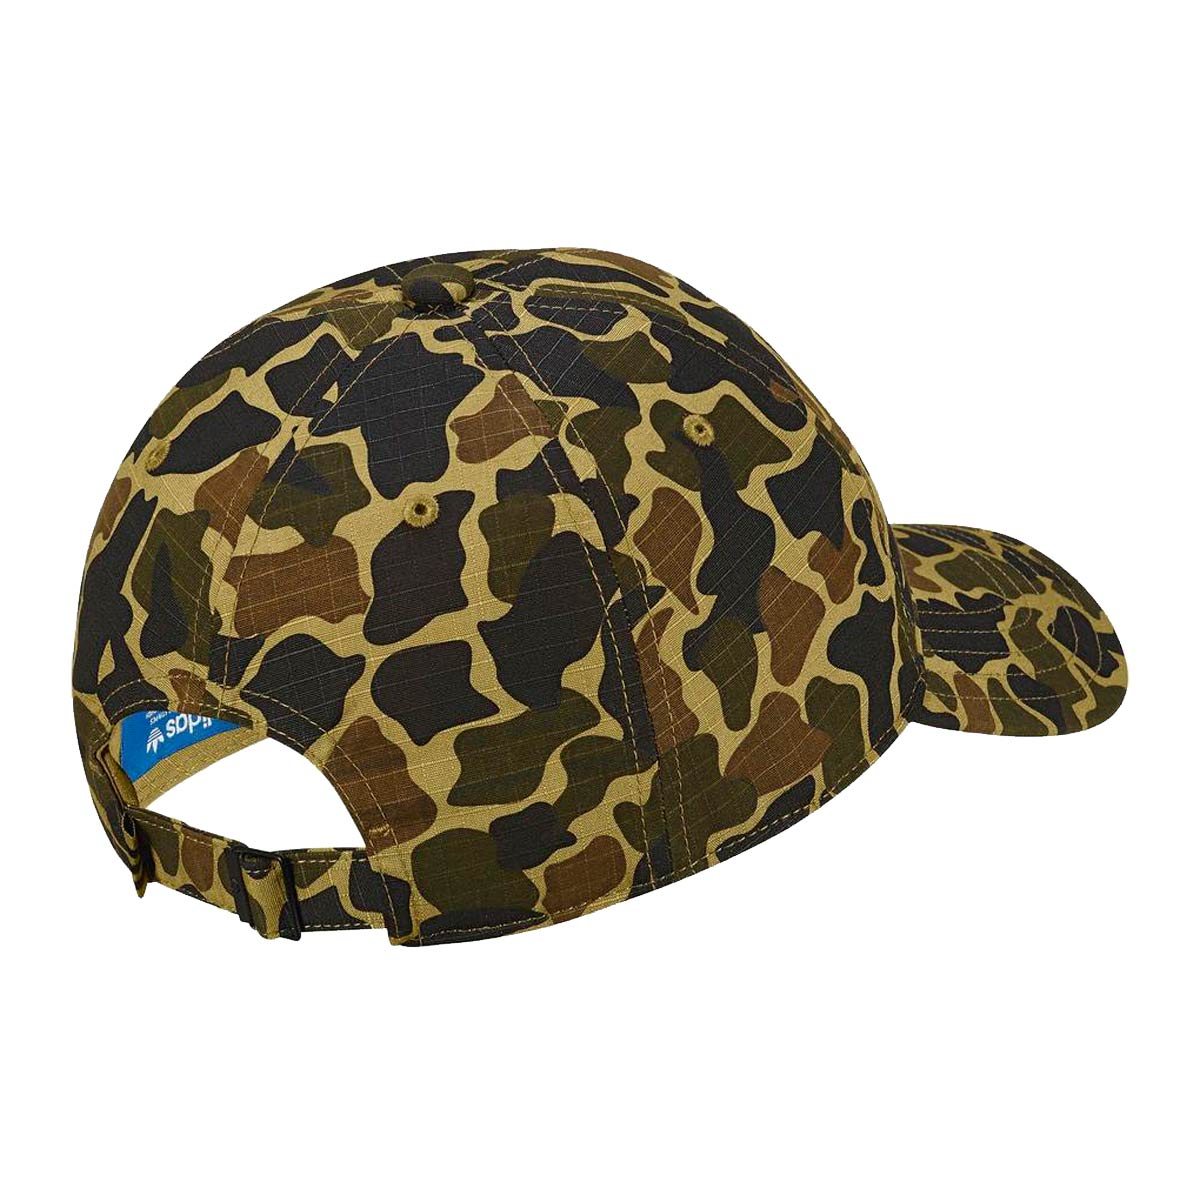 d013a65aa9e1e4 ... adidas Originals CAMO BASEBALL CAP (Adidas originals duck baseball cap)  DARK SAHARA 18SS- ...